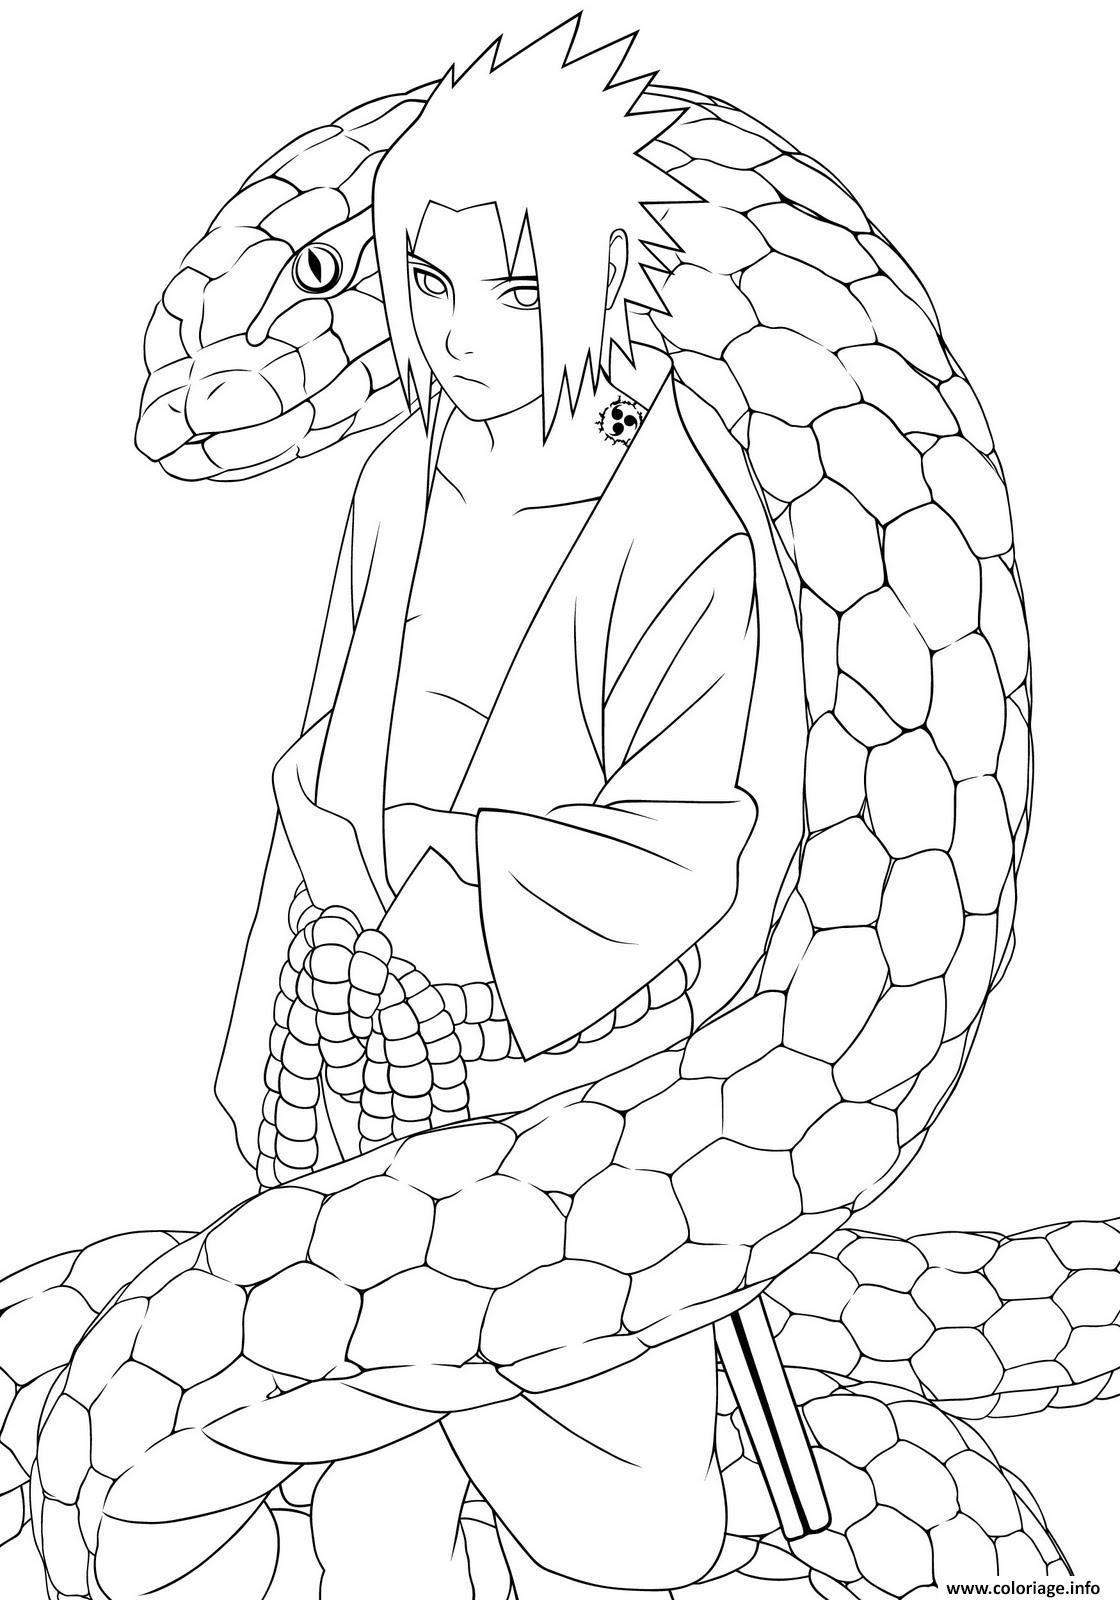 Coloriage Manga Naruto 2 Dessin  Imprimer